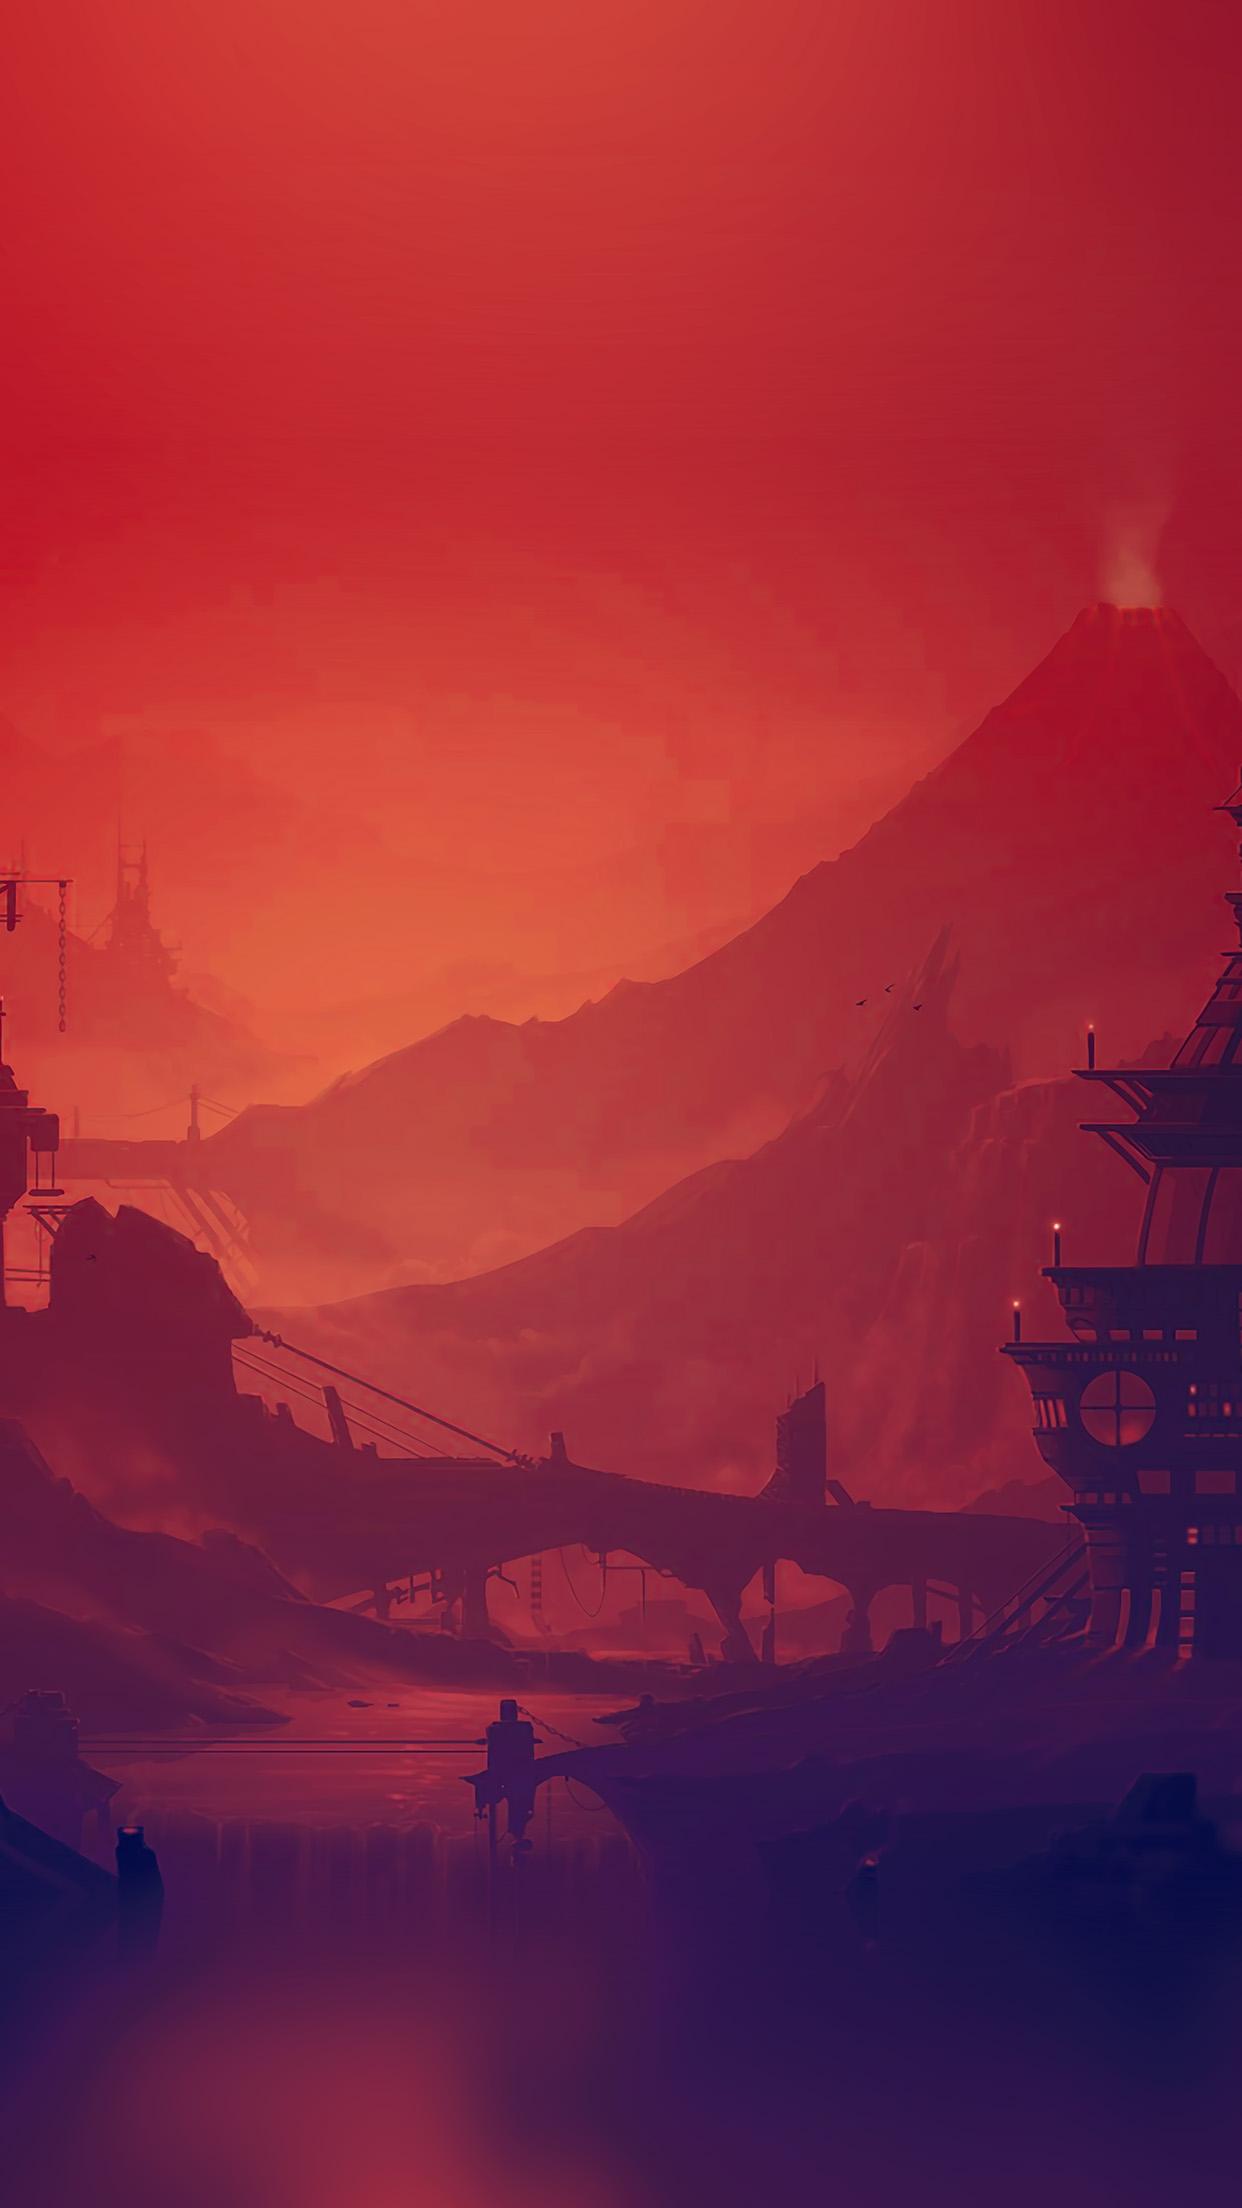 ar20-red-purple-river-illustration-art-anime-wallpaper